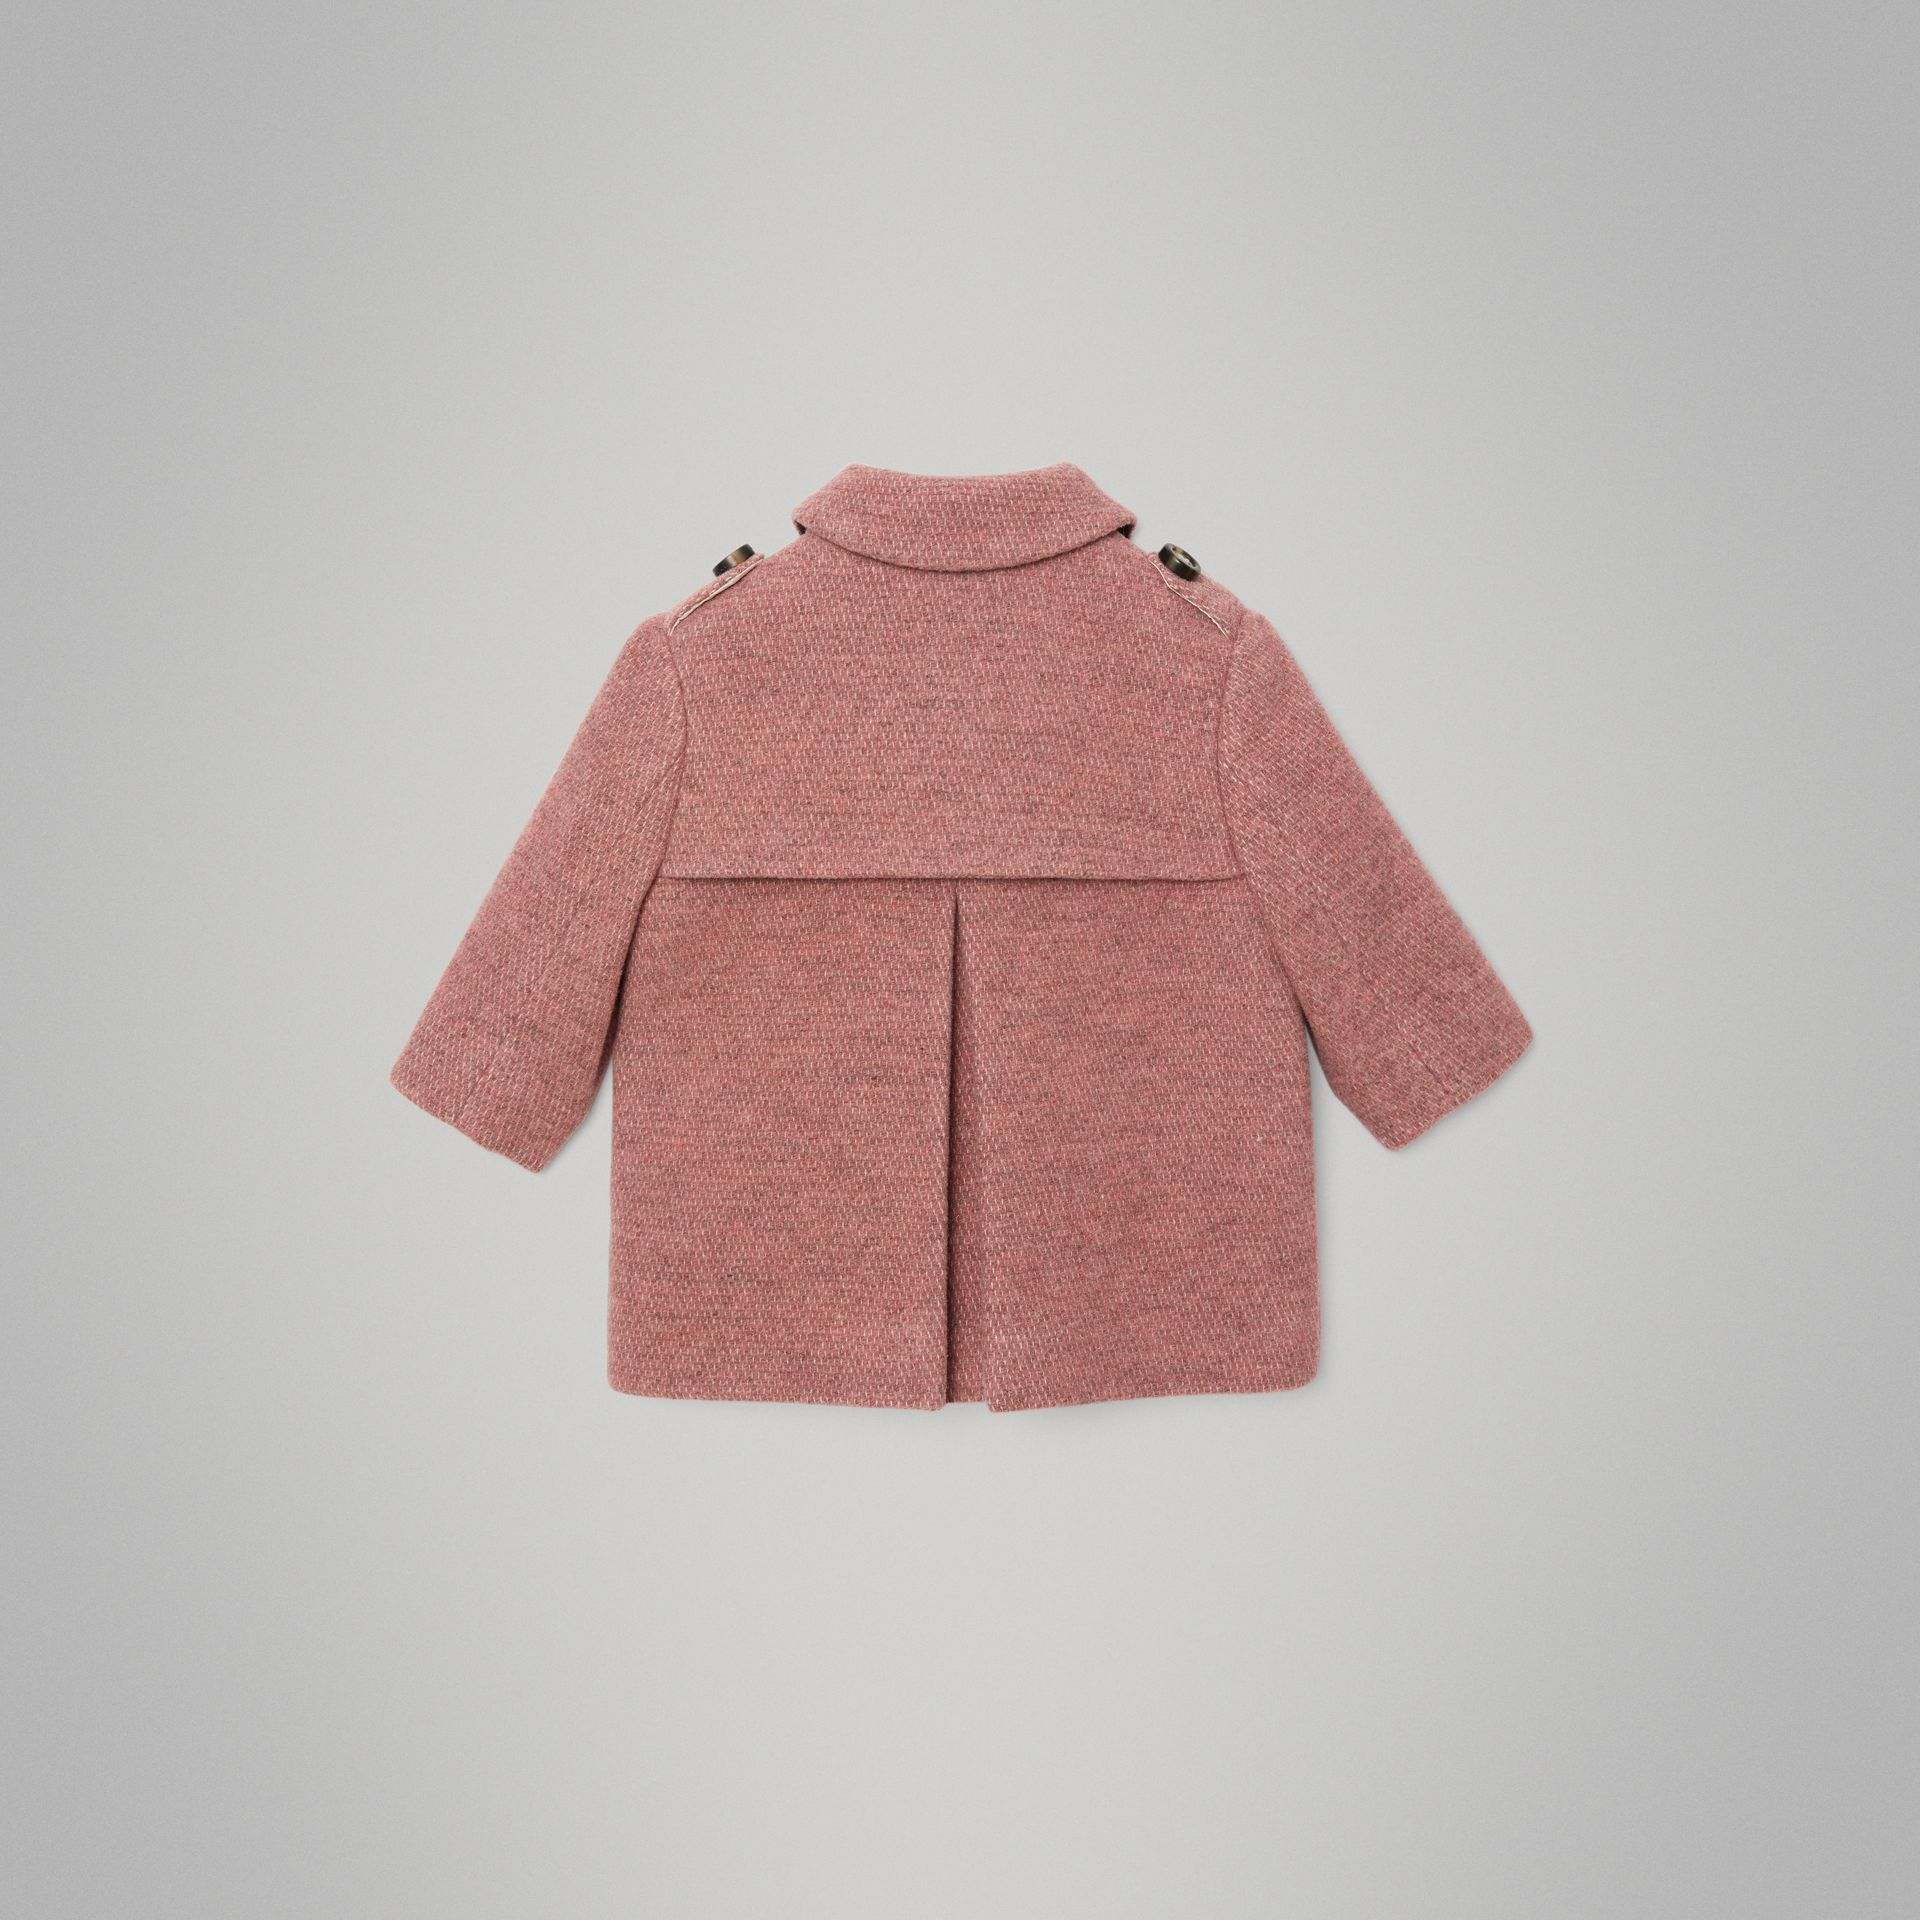 Peacoat aus einer Wollmischung (Rosenrosa Meliert) - Kinder | Burberry - Galerie-Bild 3